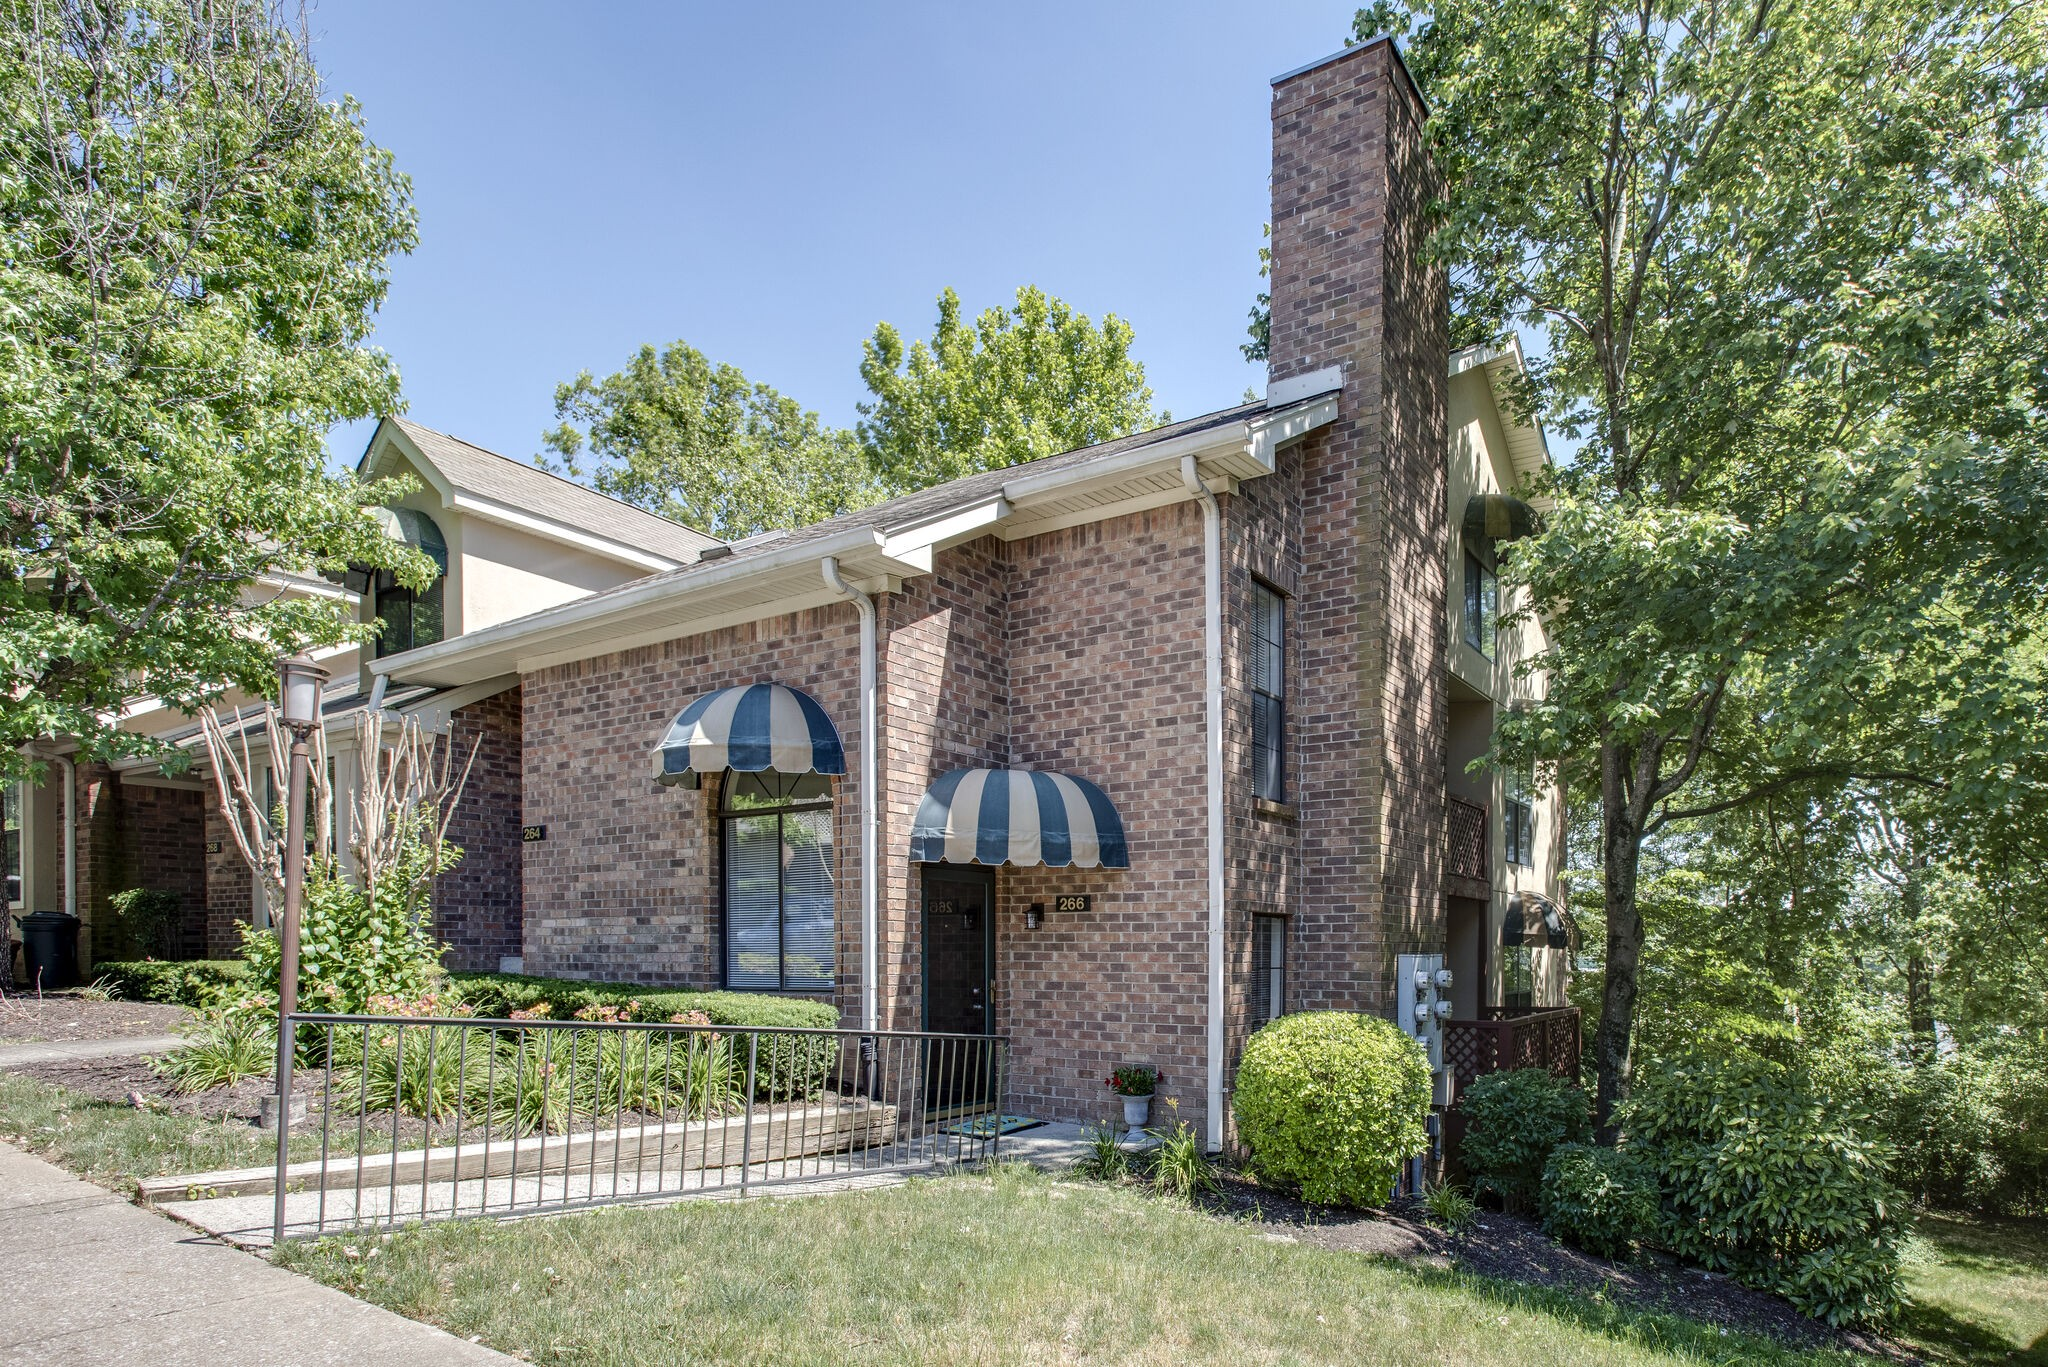 266 Glenstone Cir Property Photo - Brentwood, TN real estate listing